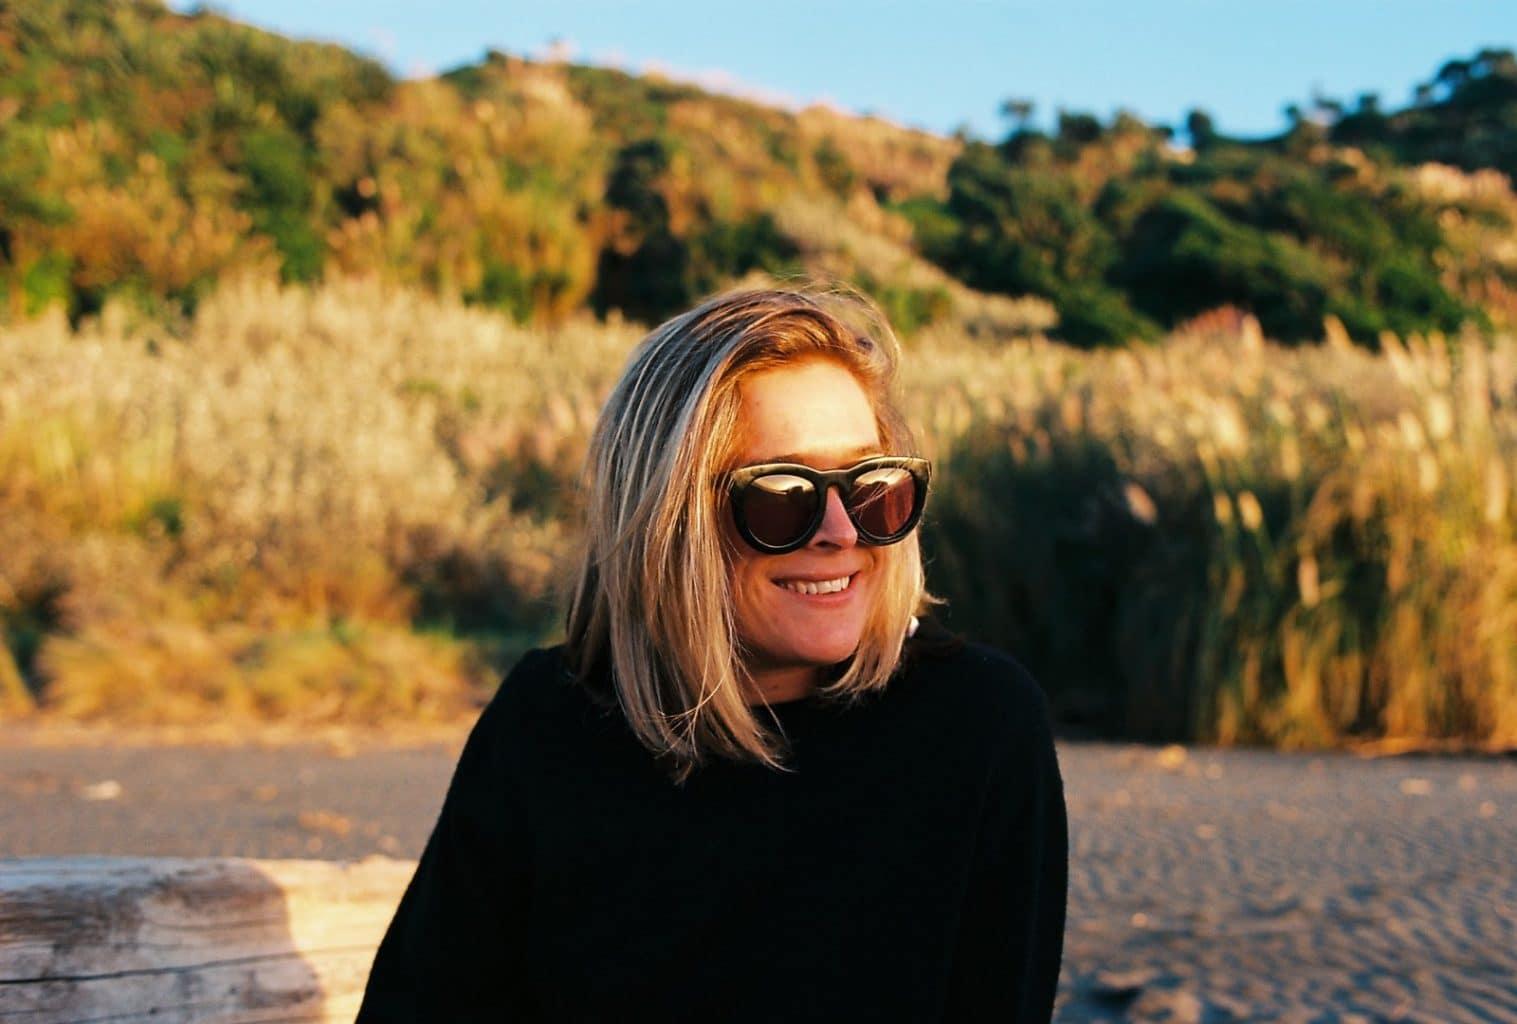 Elisha Blogg